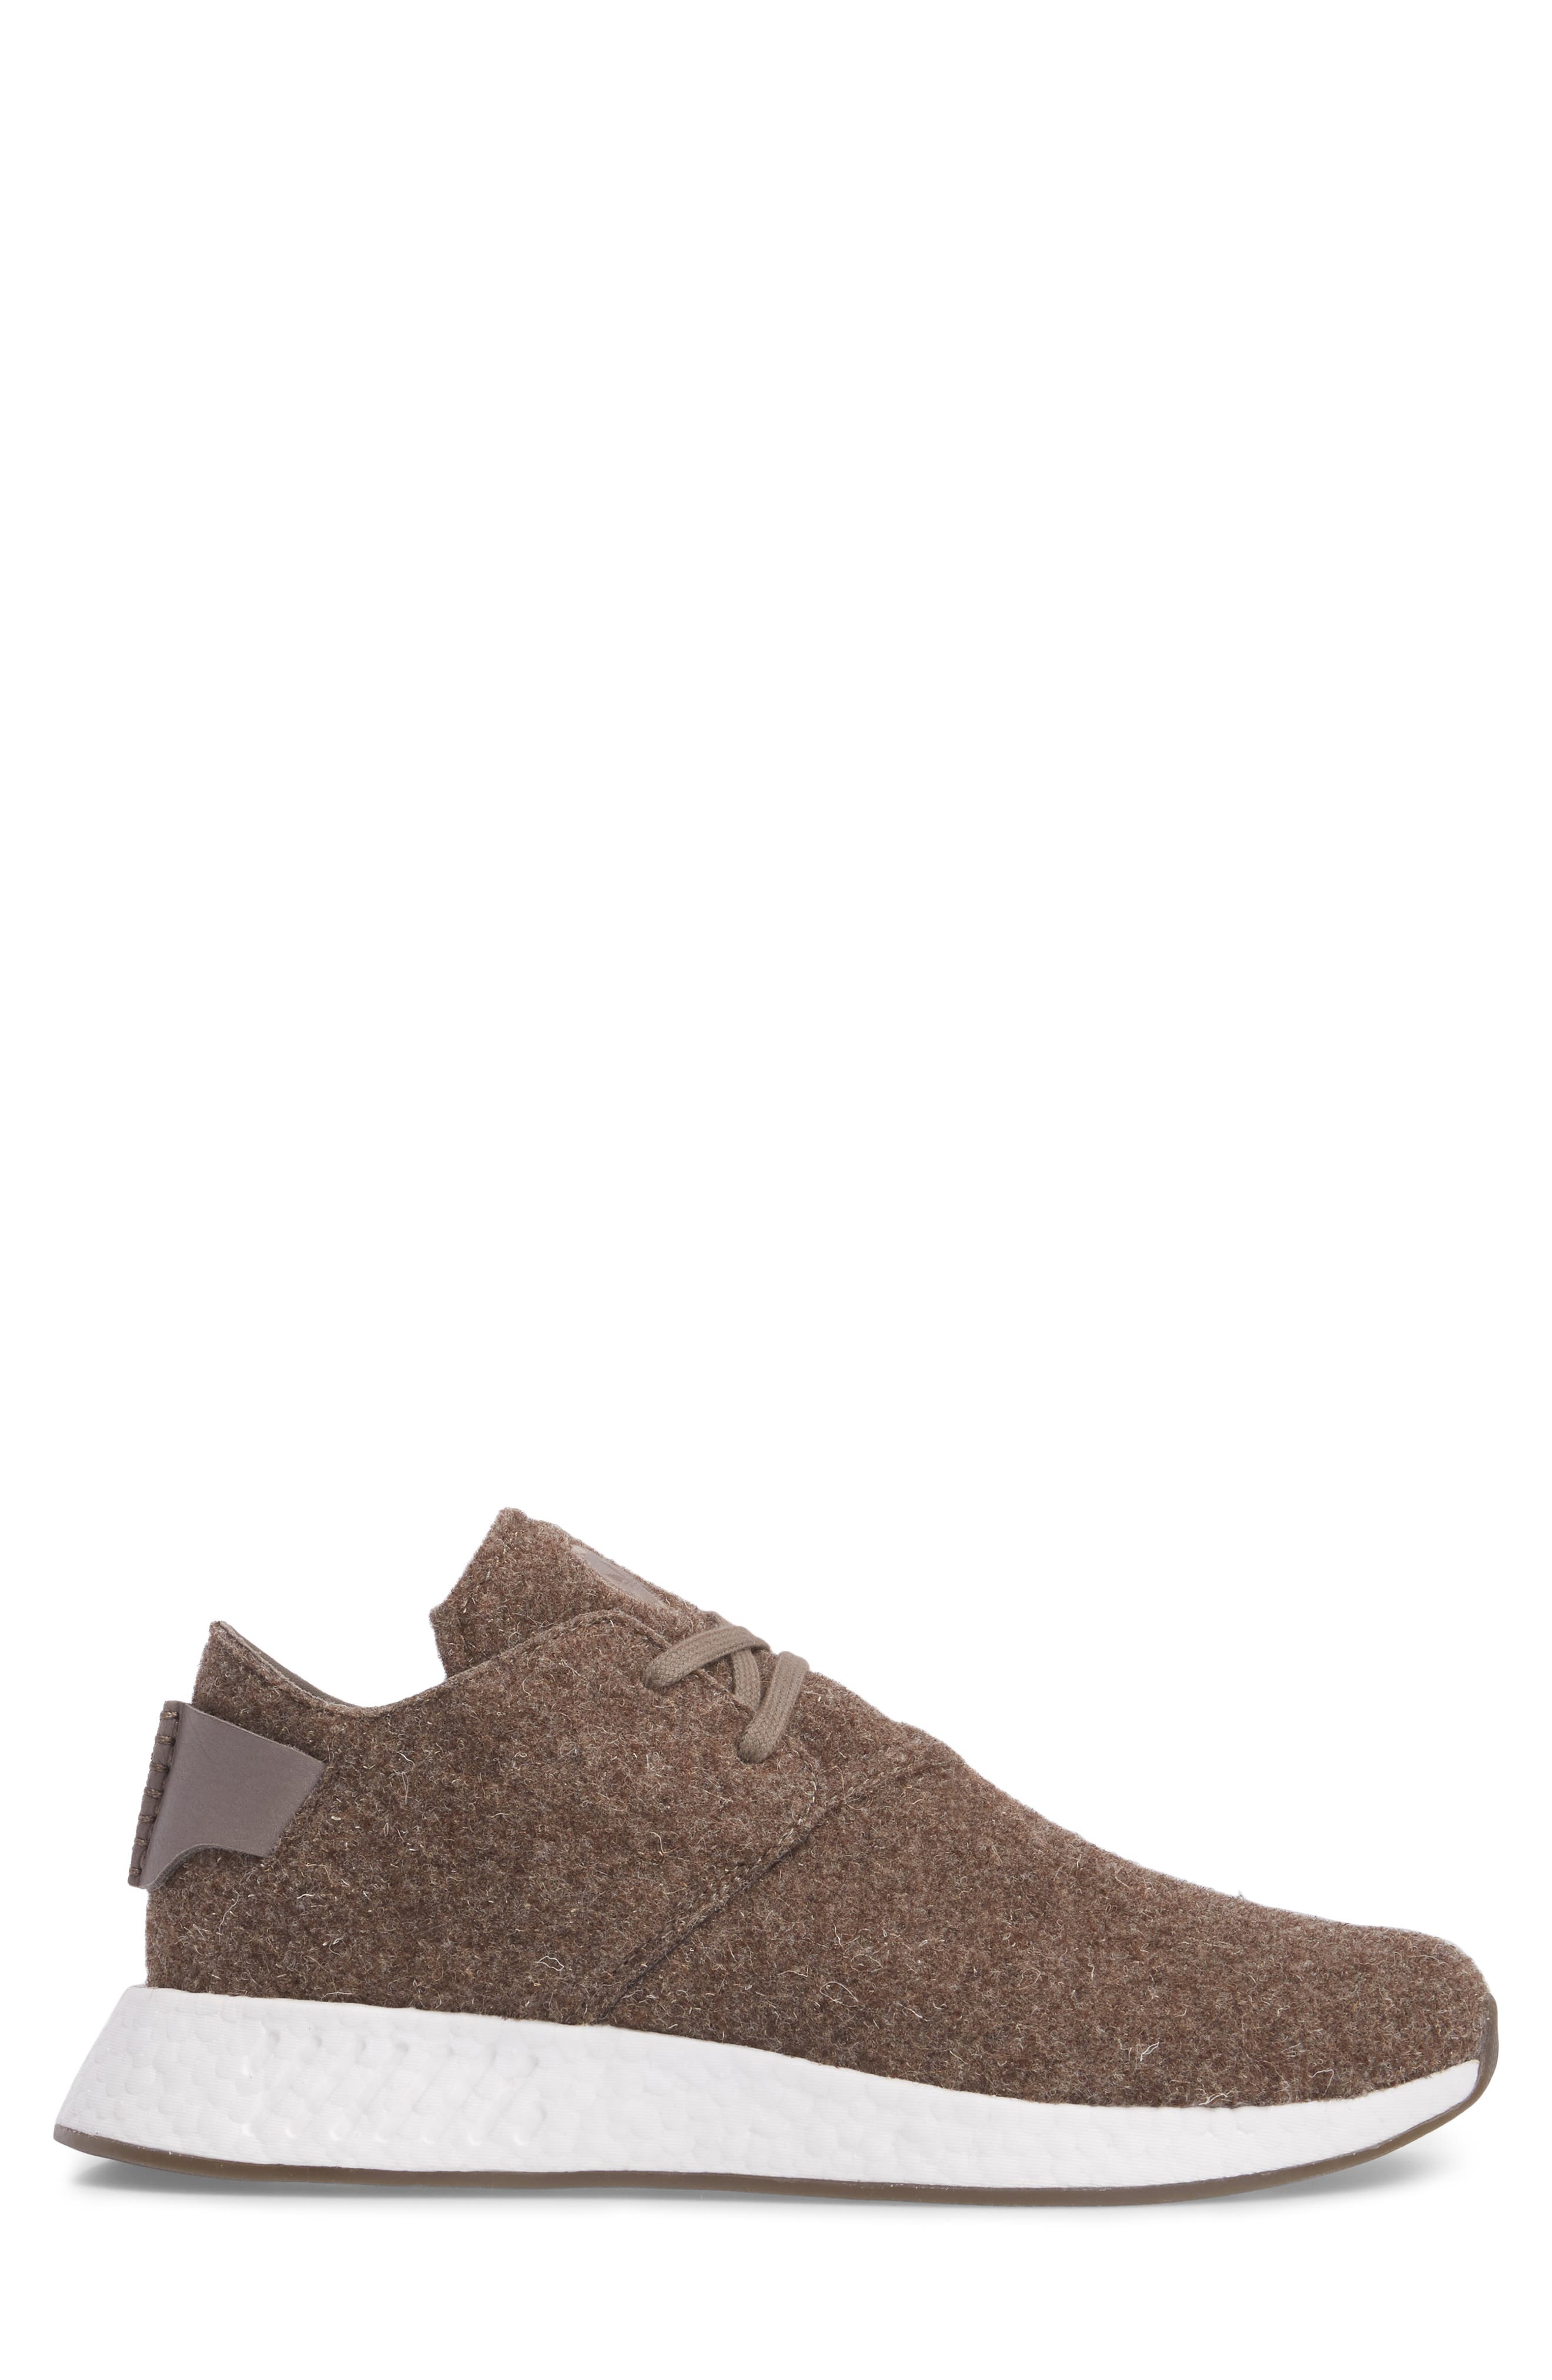 NMD C2 Sneaker (Men0,                             Alternate thumbnail 3, color,